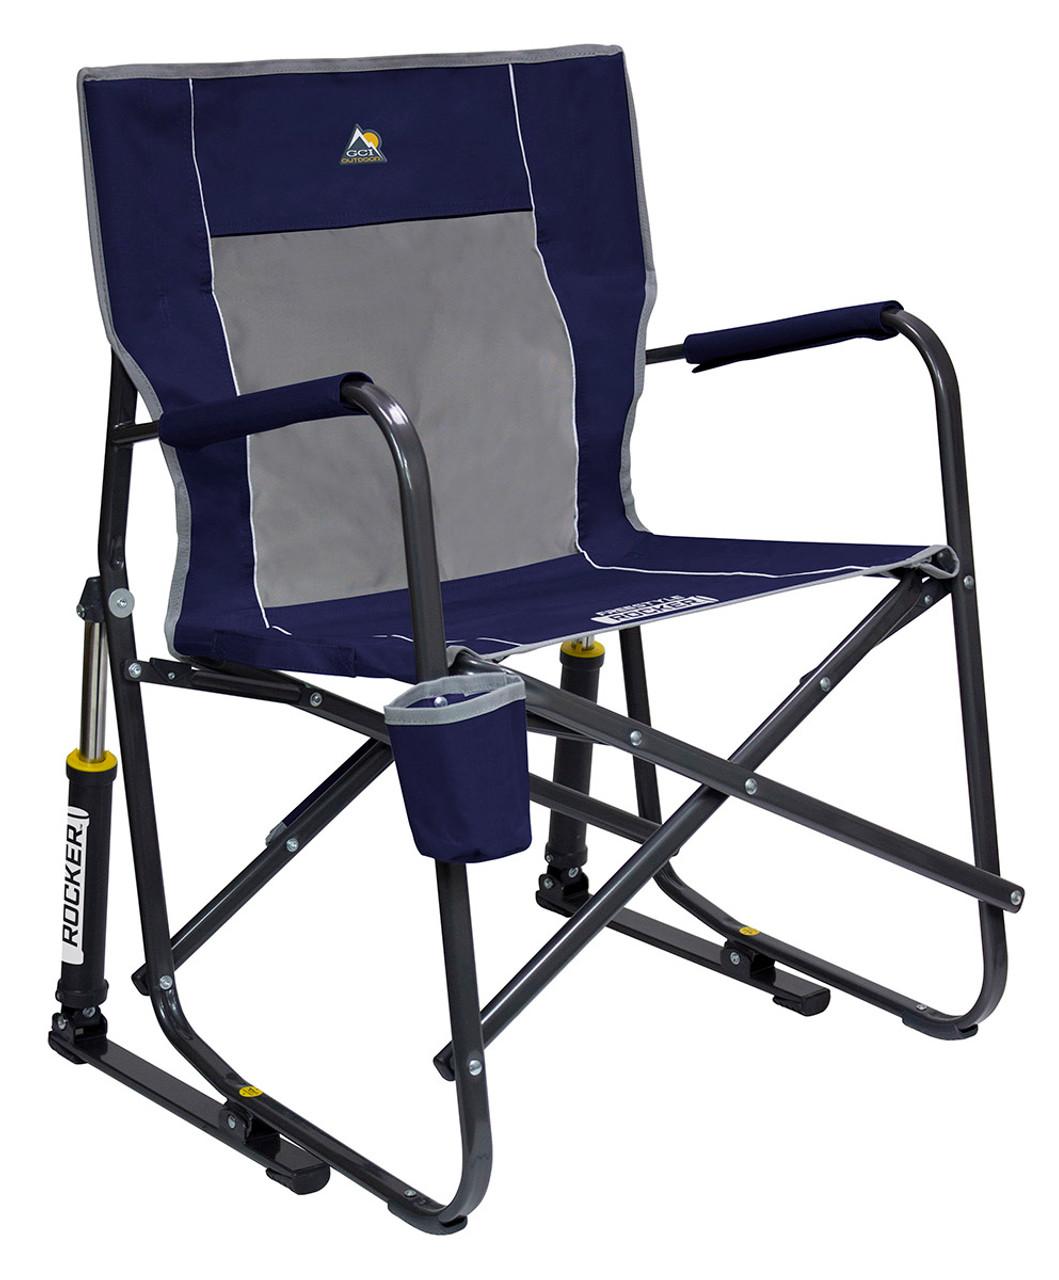 Incredible Gci Outdoor Freestyle Rocker Ibusinesslaw Wood Chair Design Ideas Ibusinesslaworg